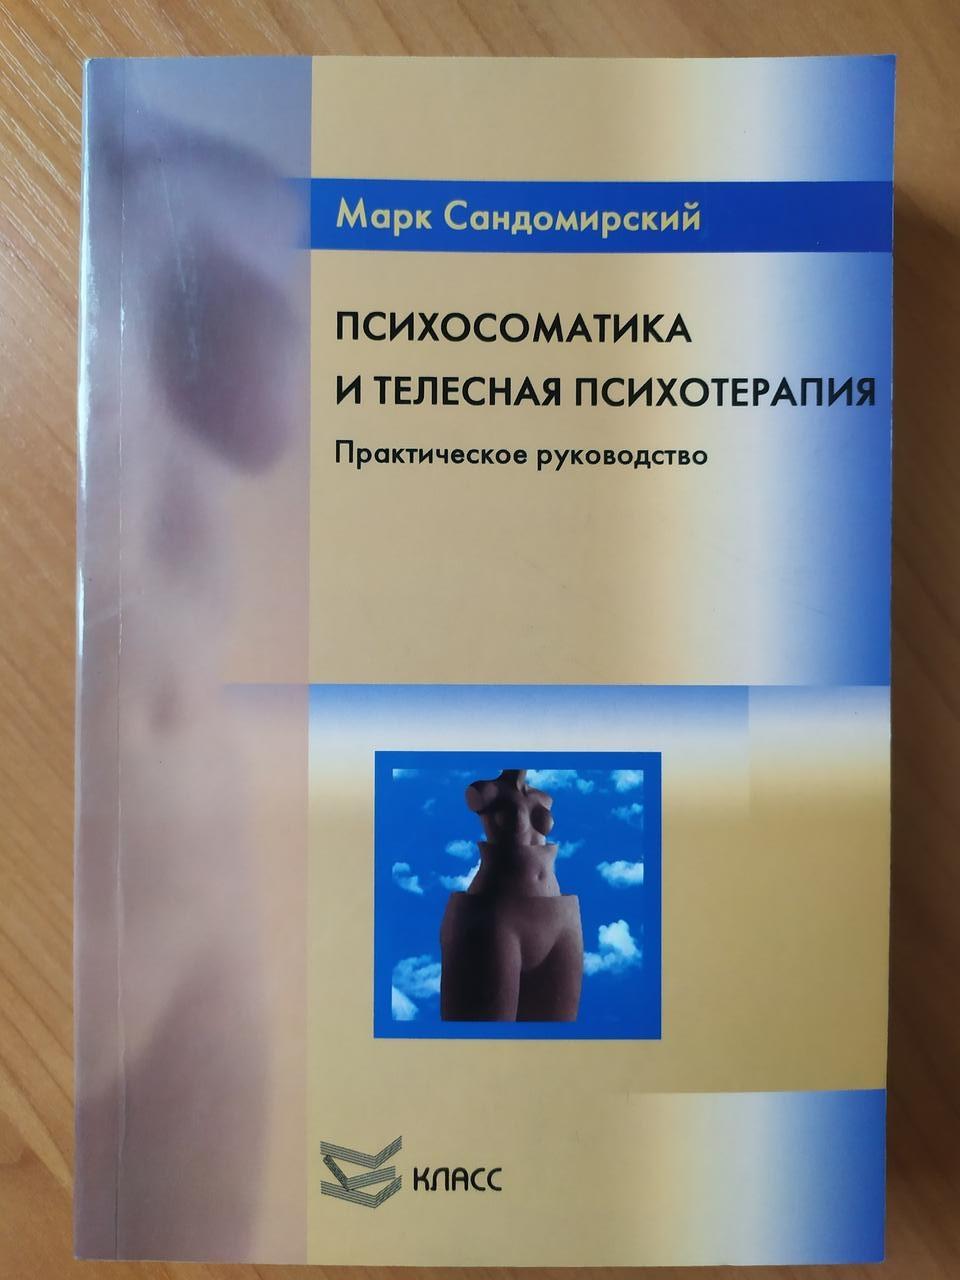 Сандомирский М.Е. Психосоматика и психотерапия. Практическое руководство